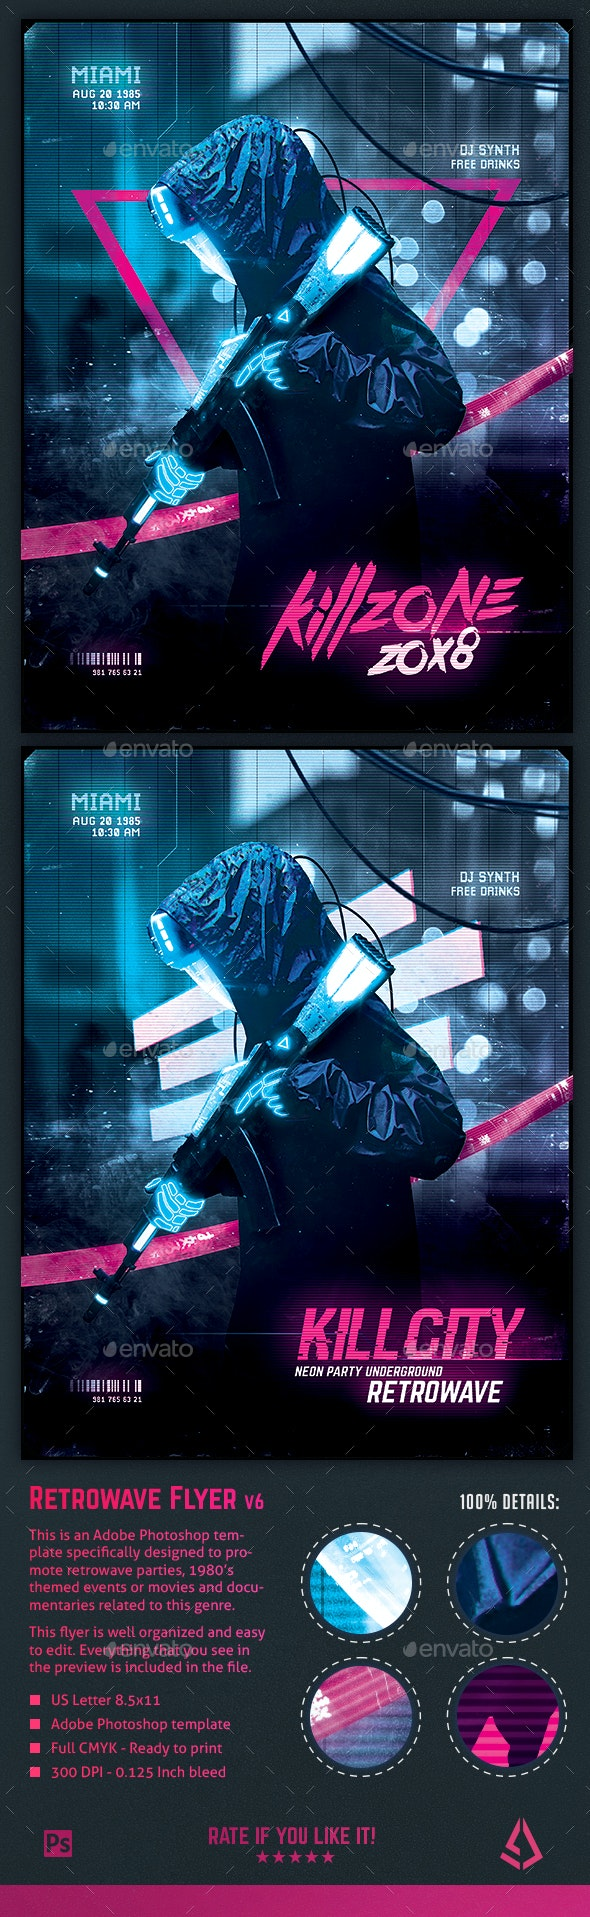 Synthwave Flyer v6 Cyberpunk Neon Retrowave Poster Template